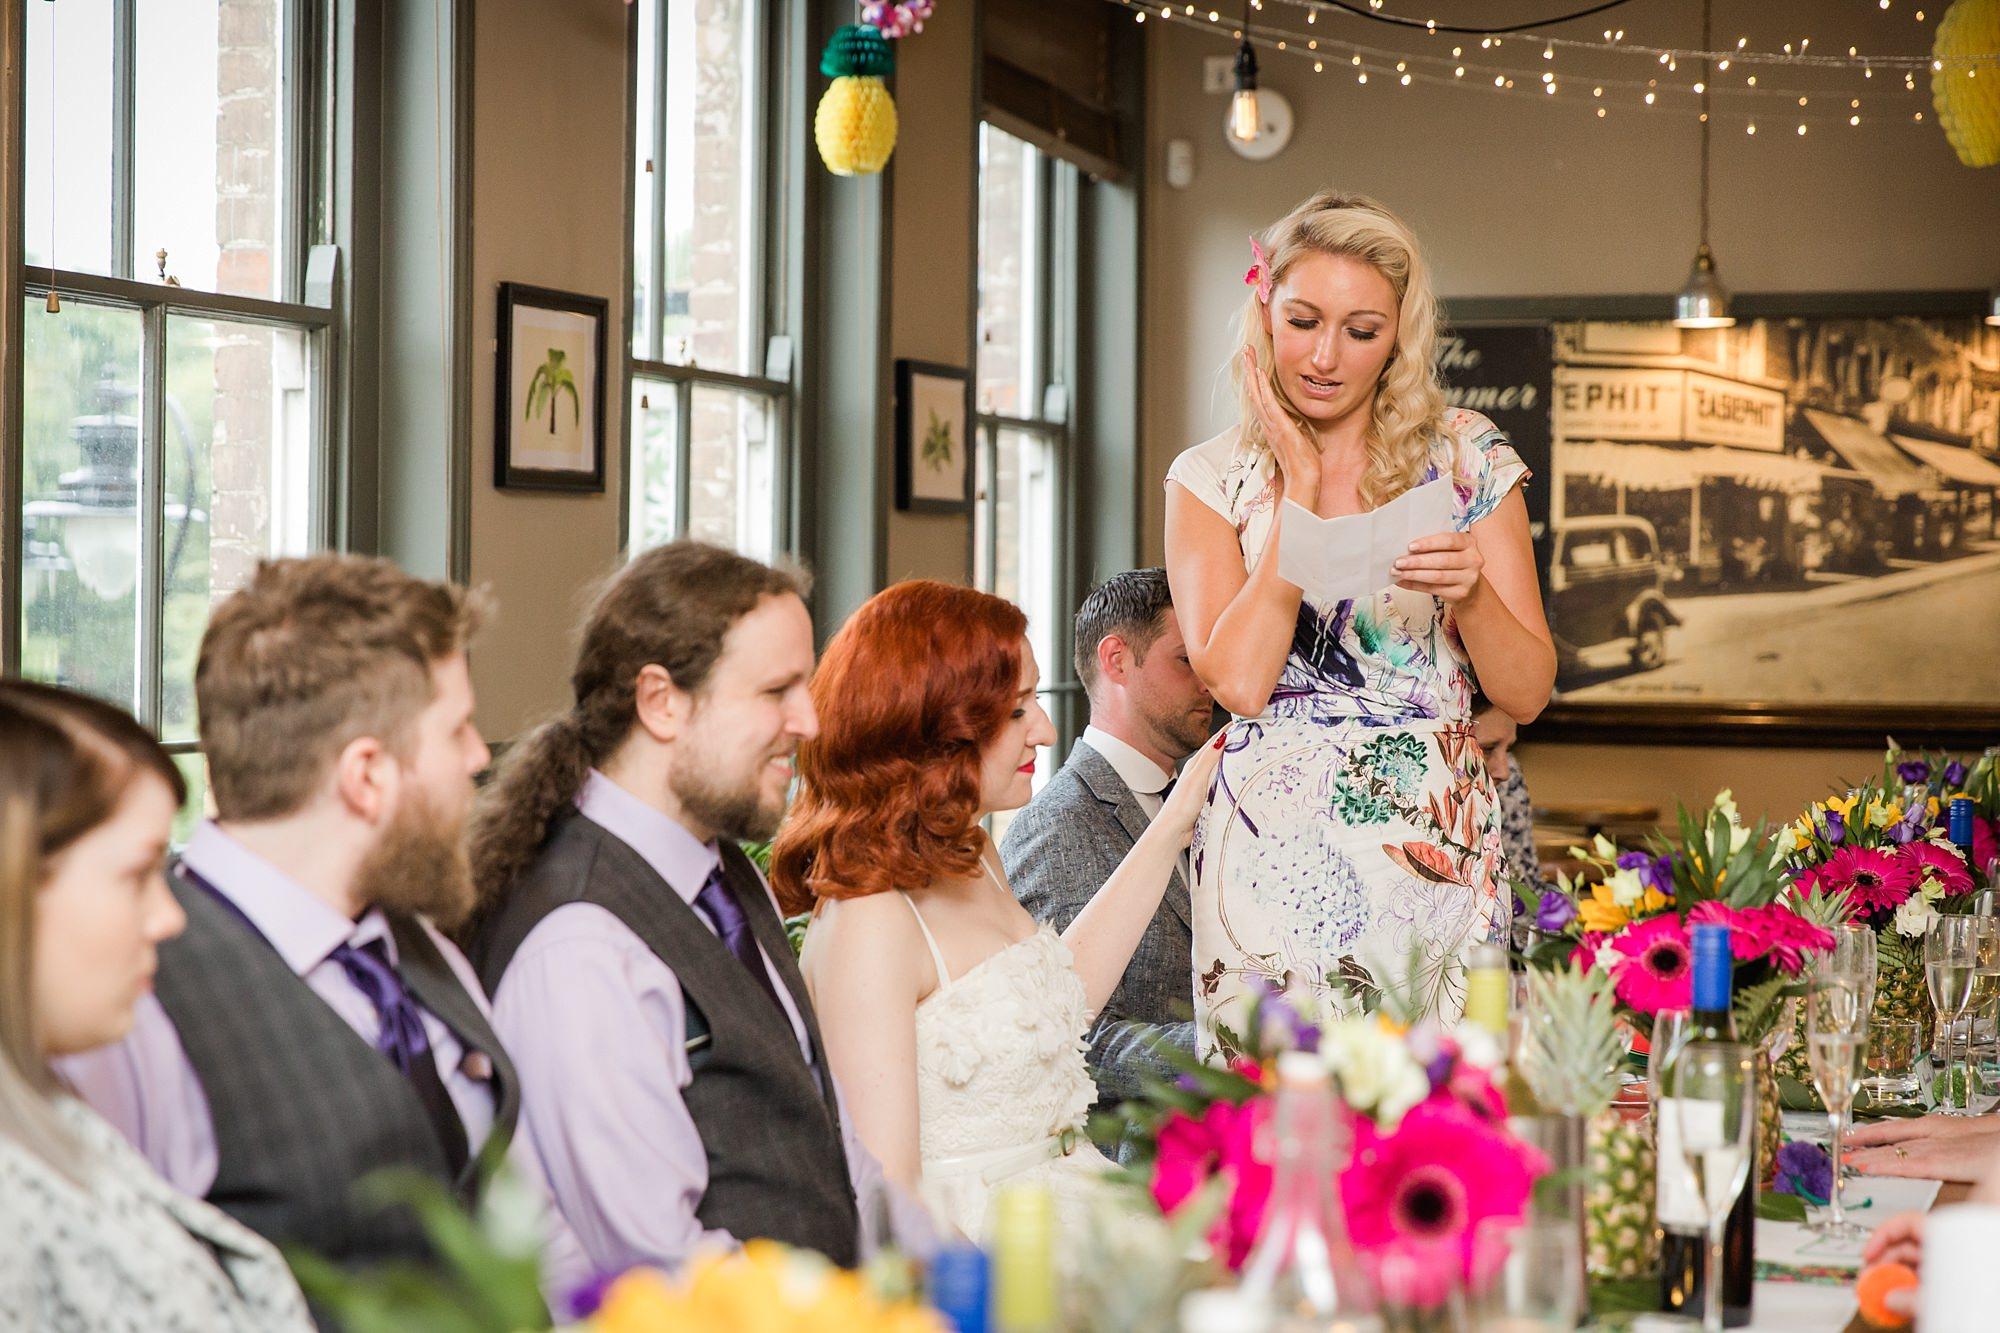 The Grange Ealing wedding bridesmaids gives a speech